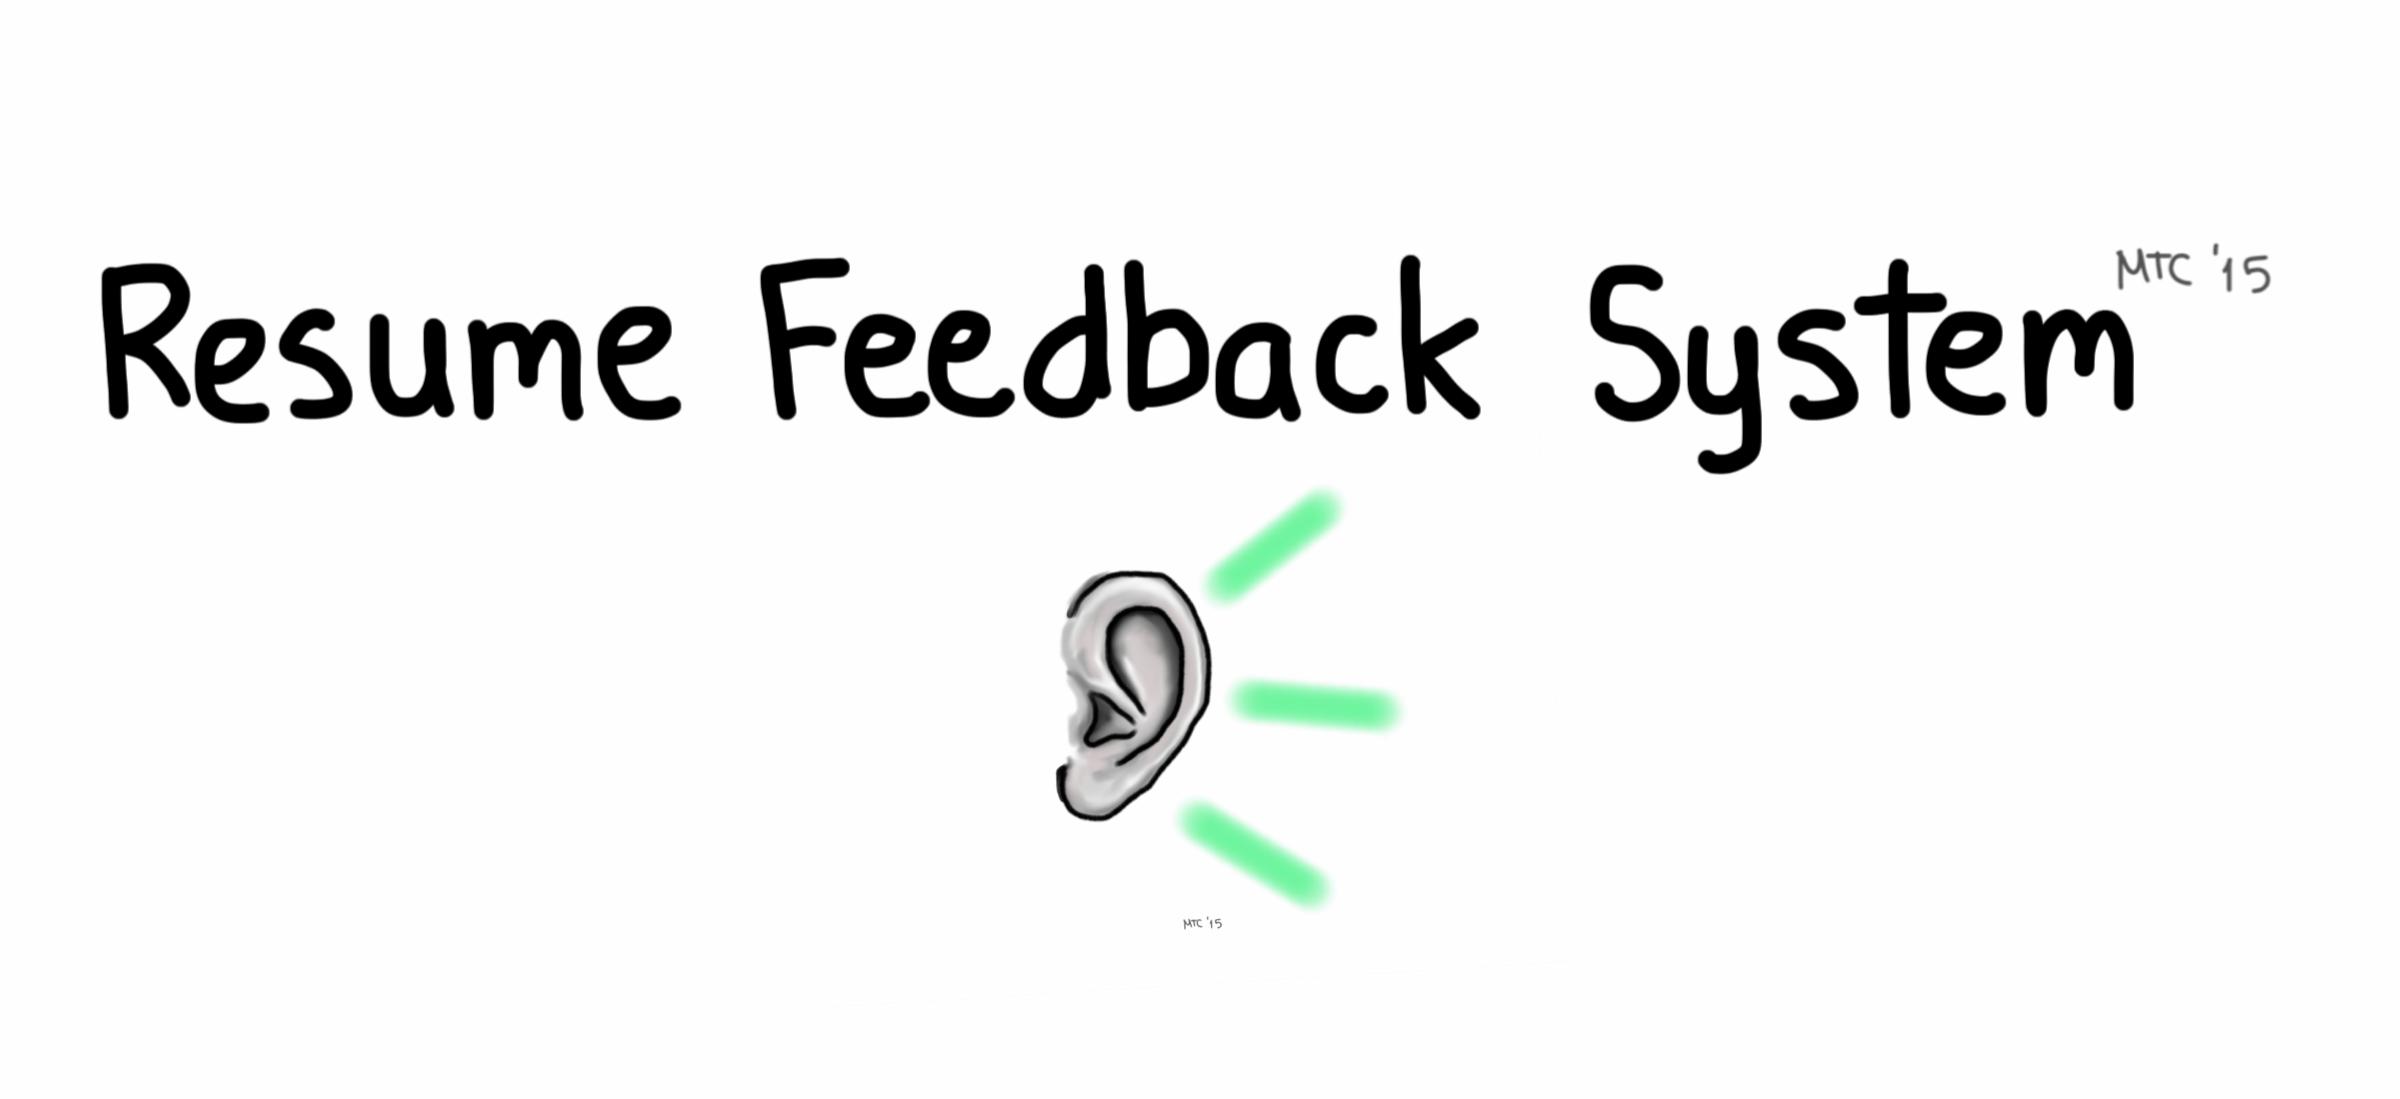 resume-feedback-system-the-resume-design-book-by-matthew-cross.jpg